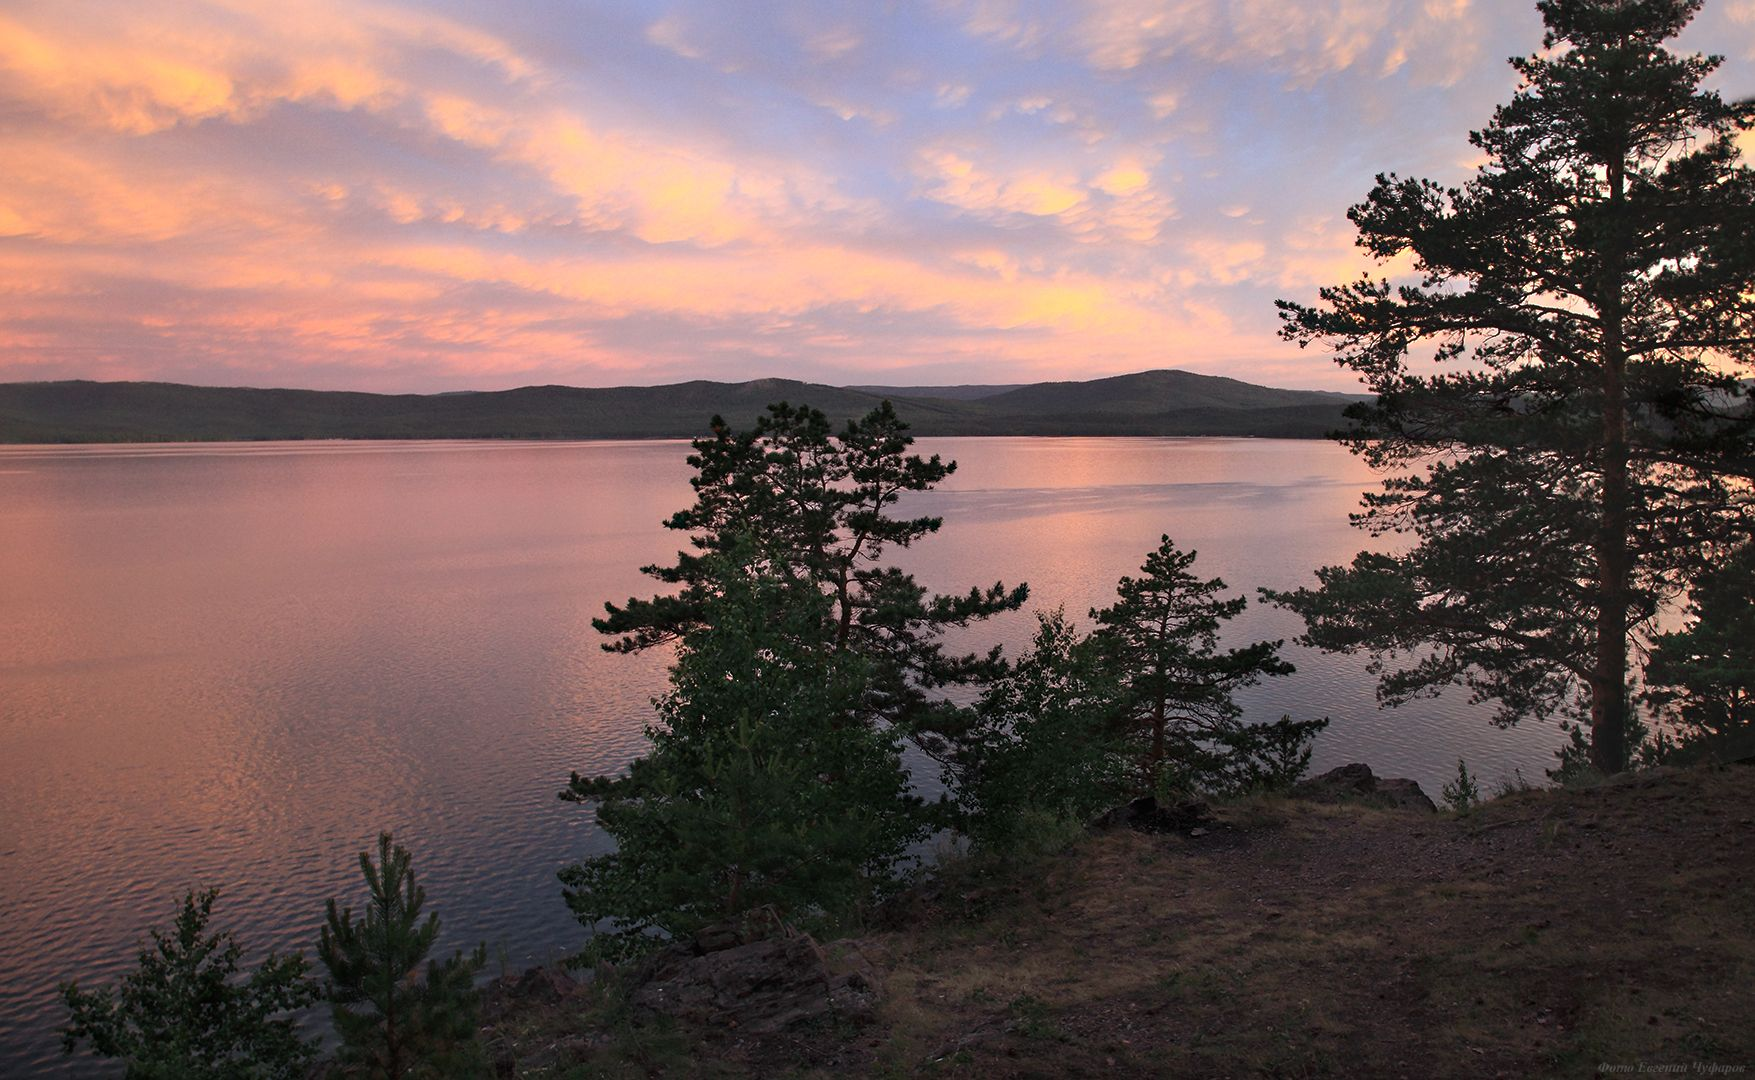 Краски восхода на озере Тургояк Восход озеро Тургояк Южный Урал